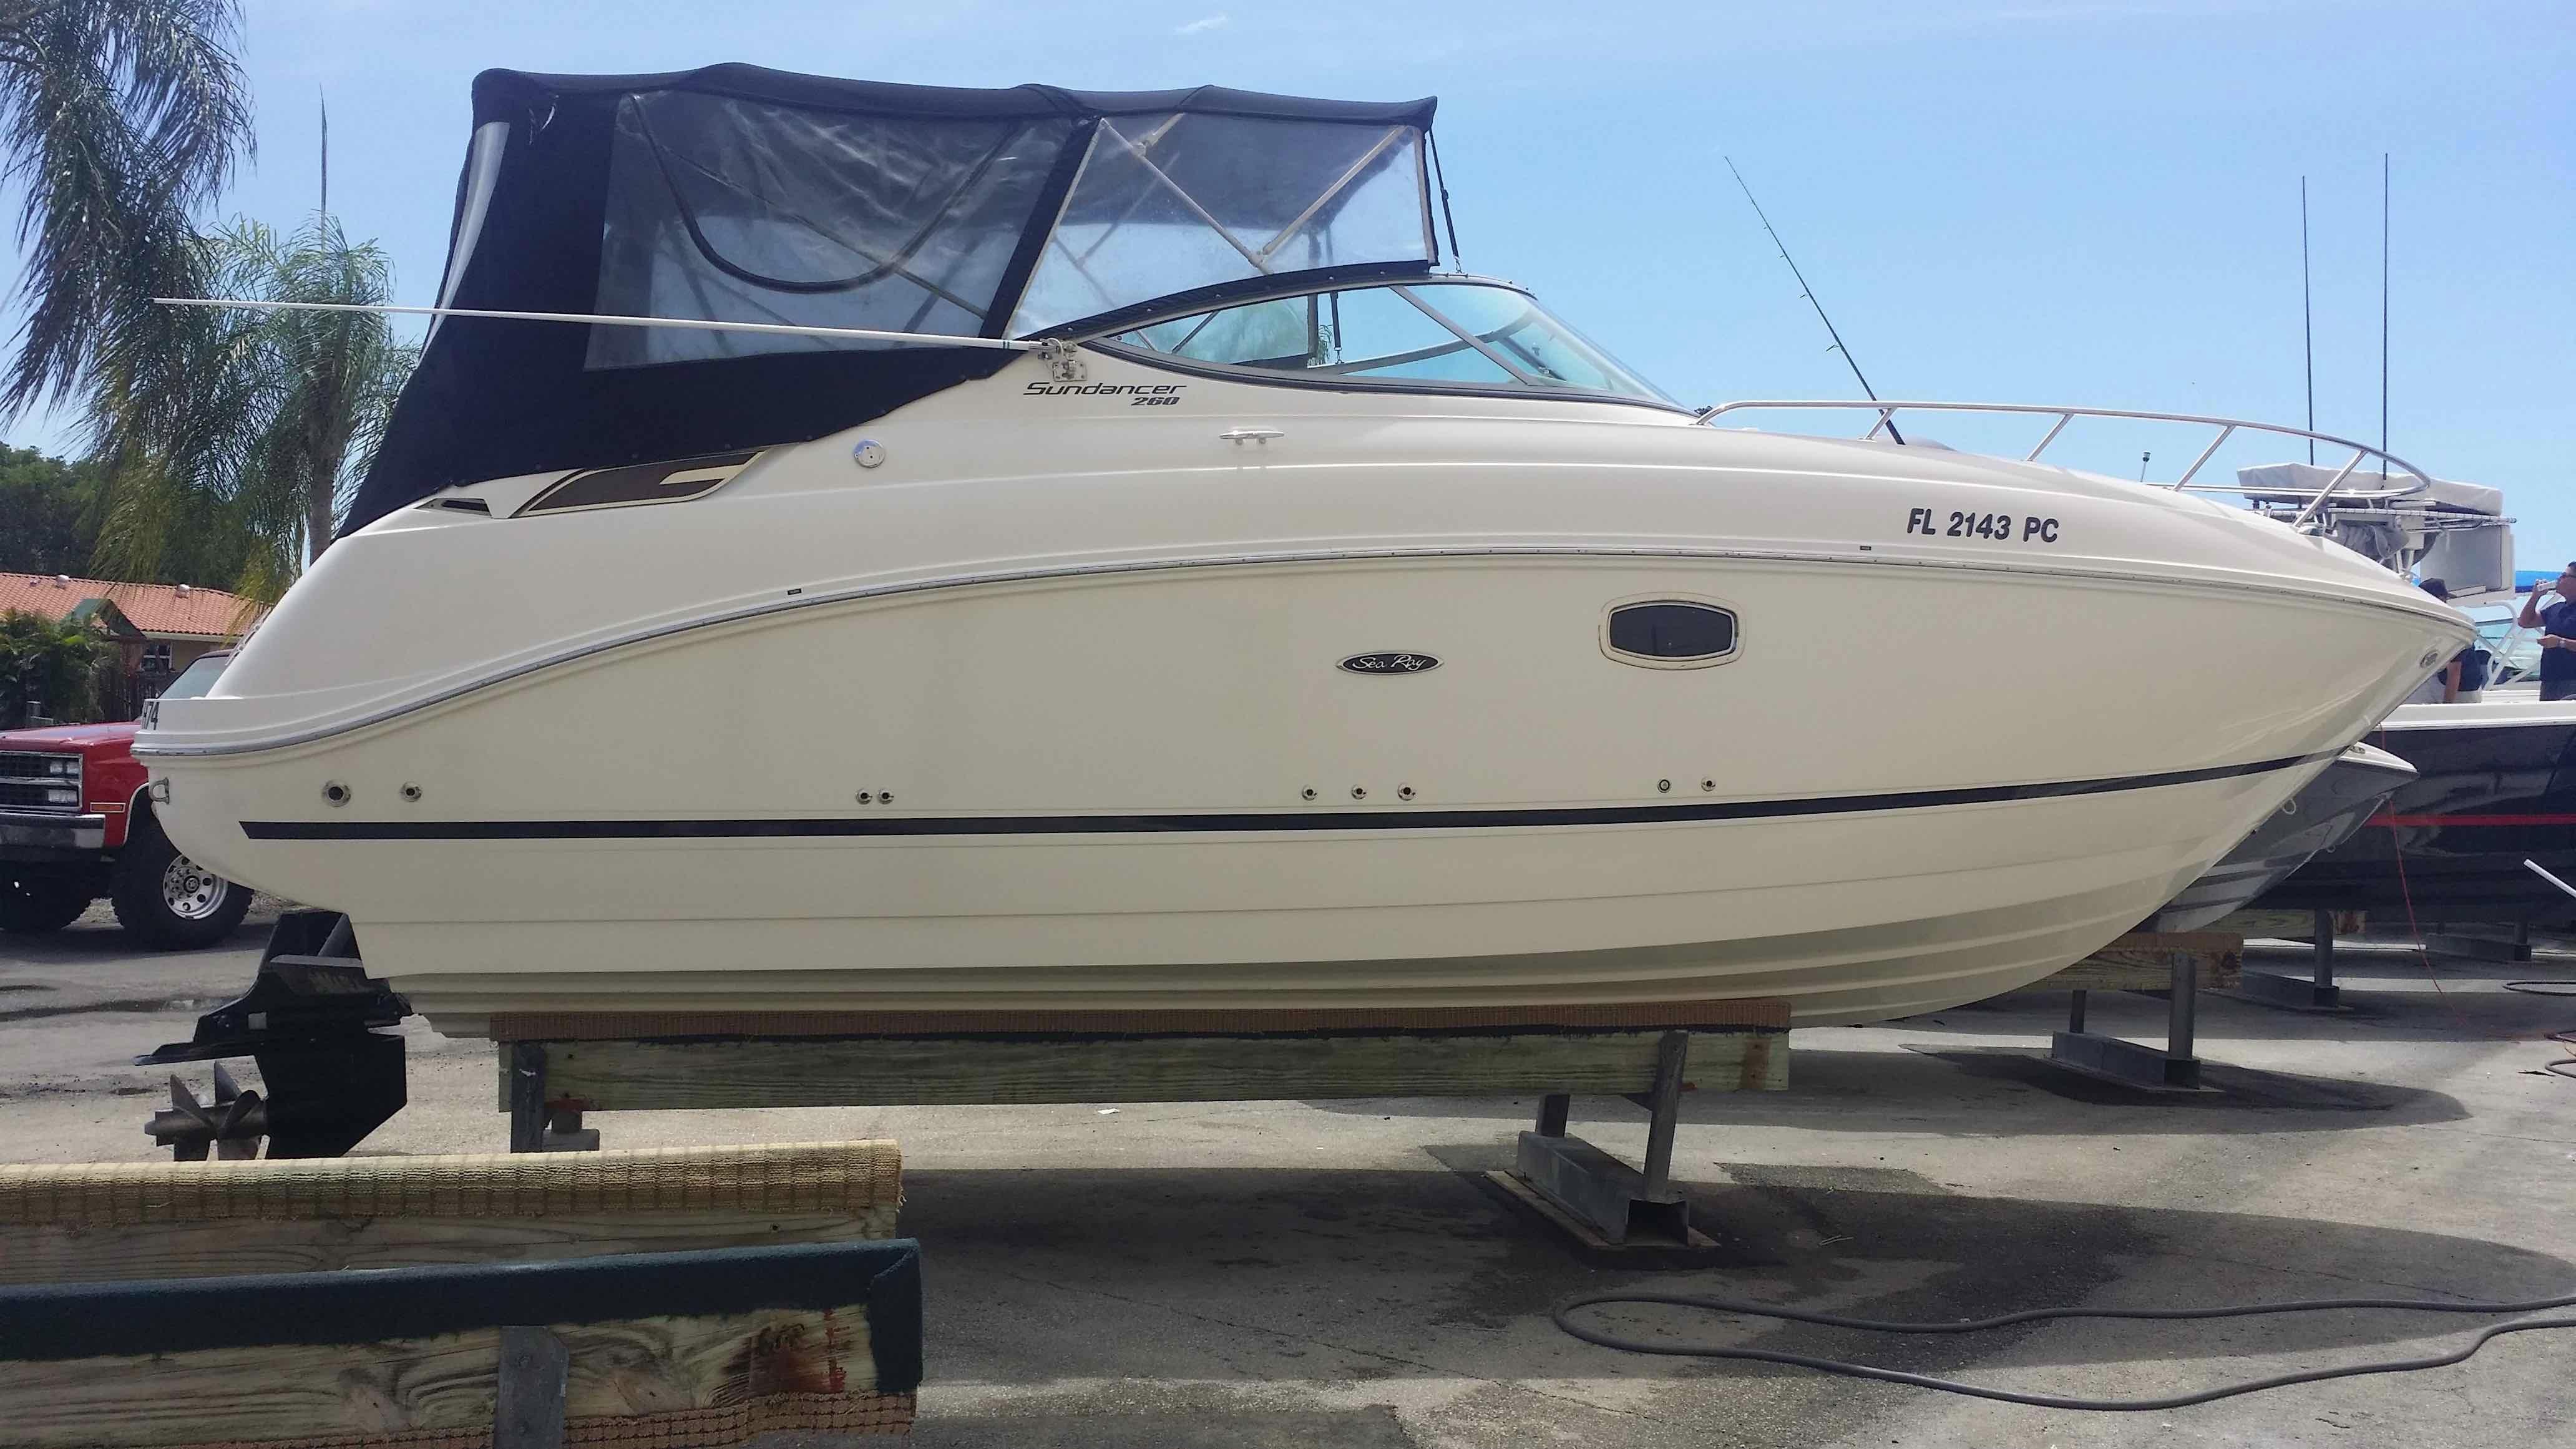 2010 Sea Ray 260 Sundancer Power Boat For Sale Www